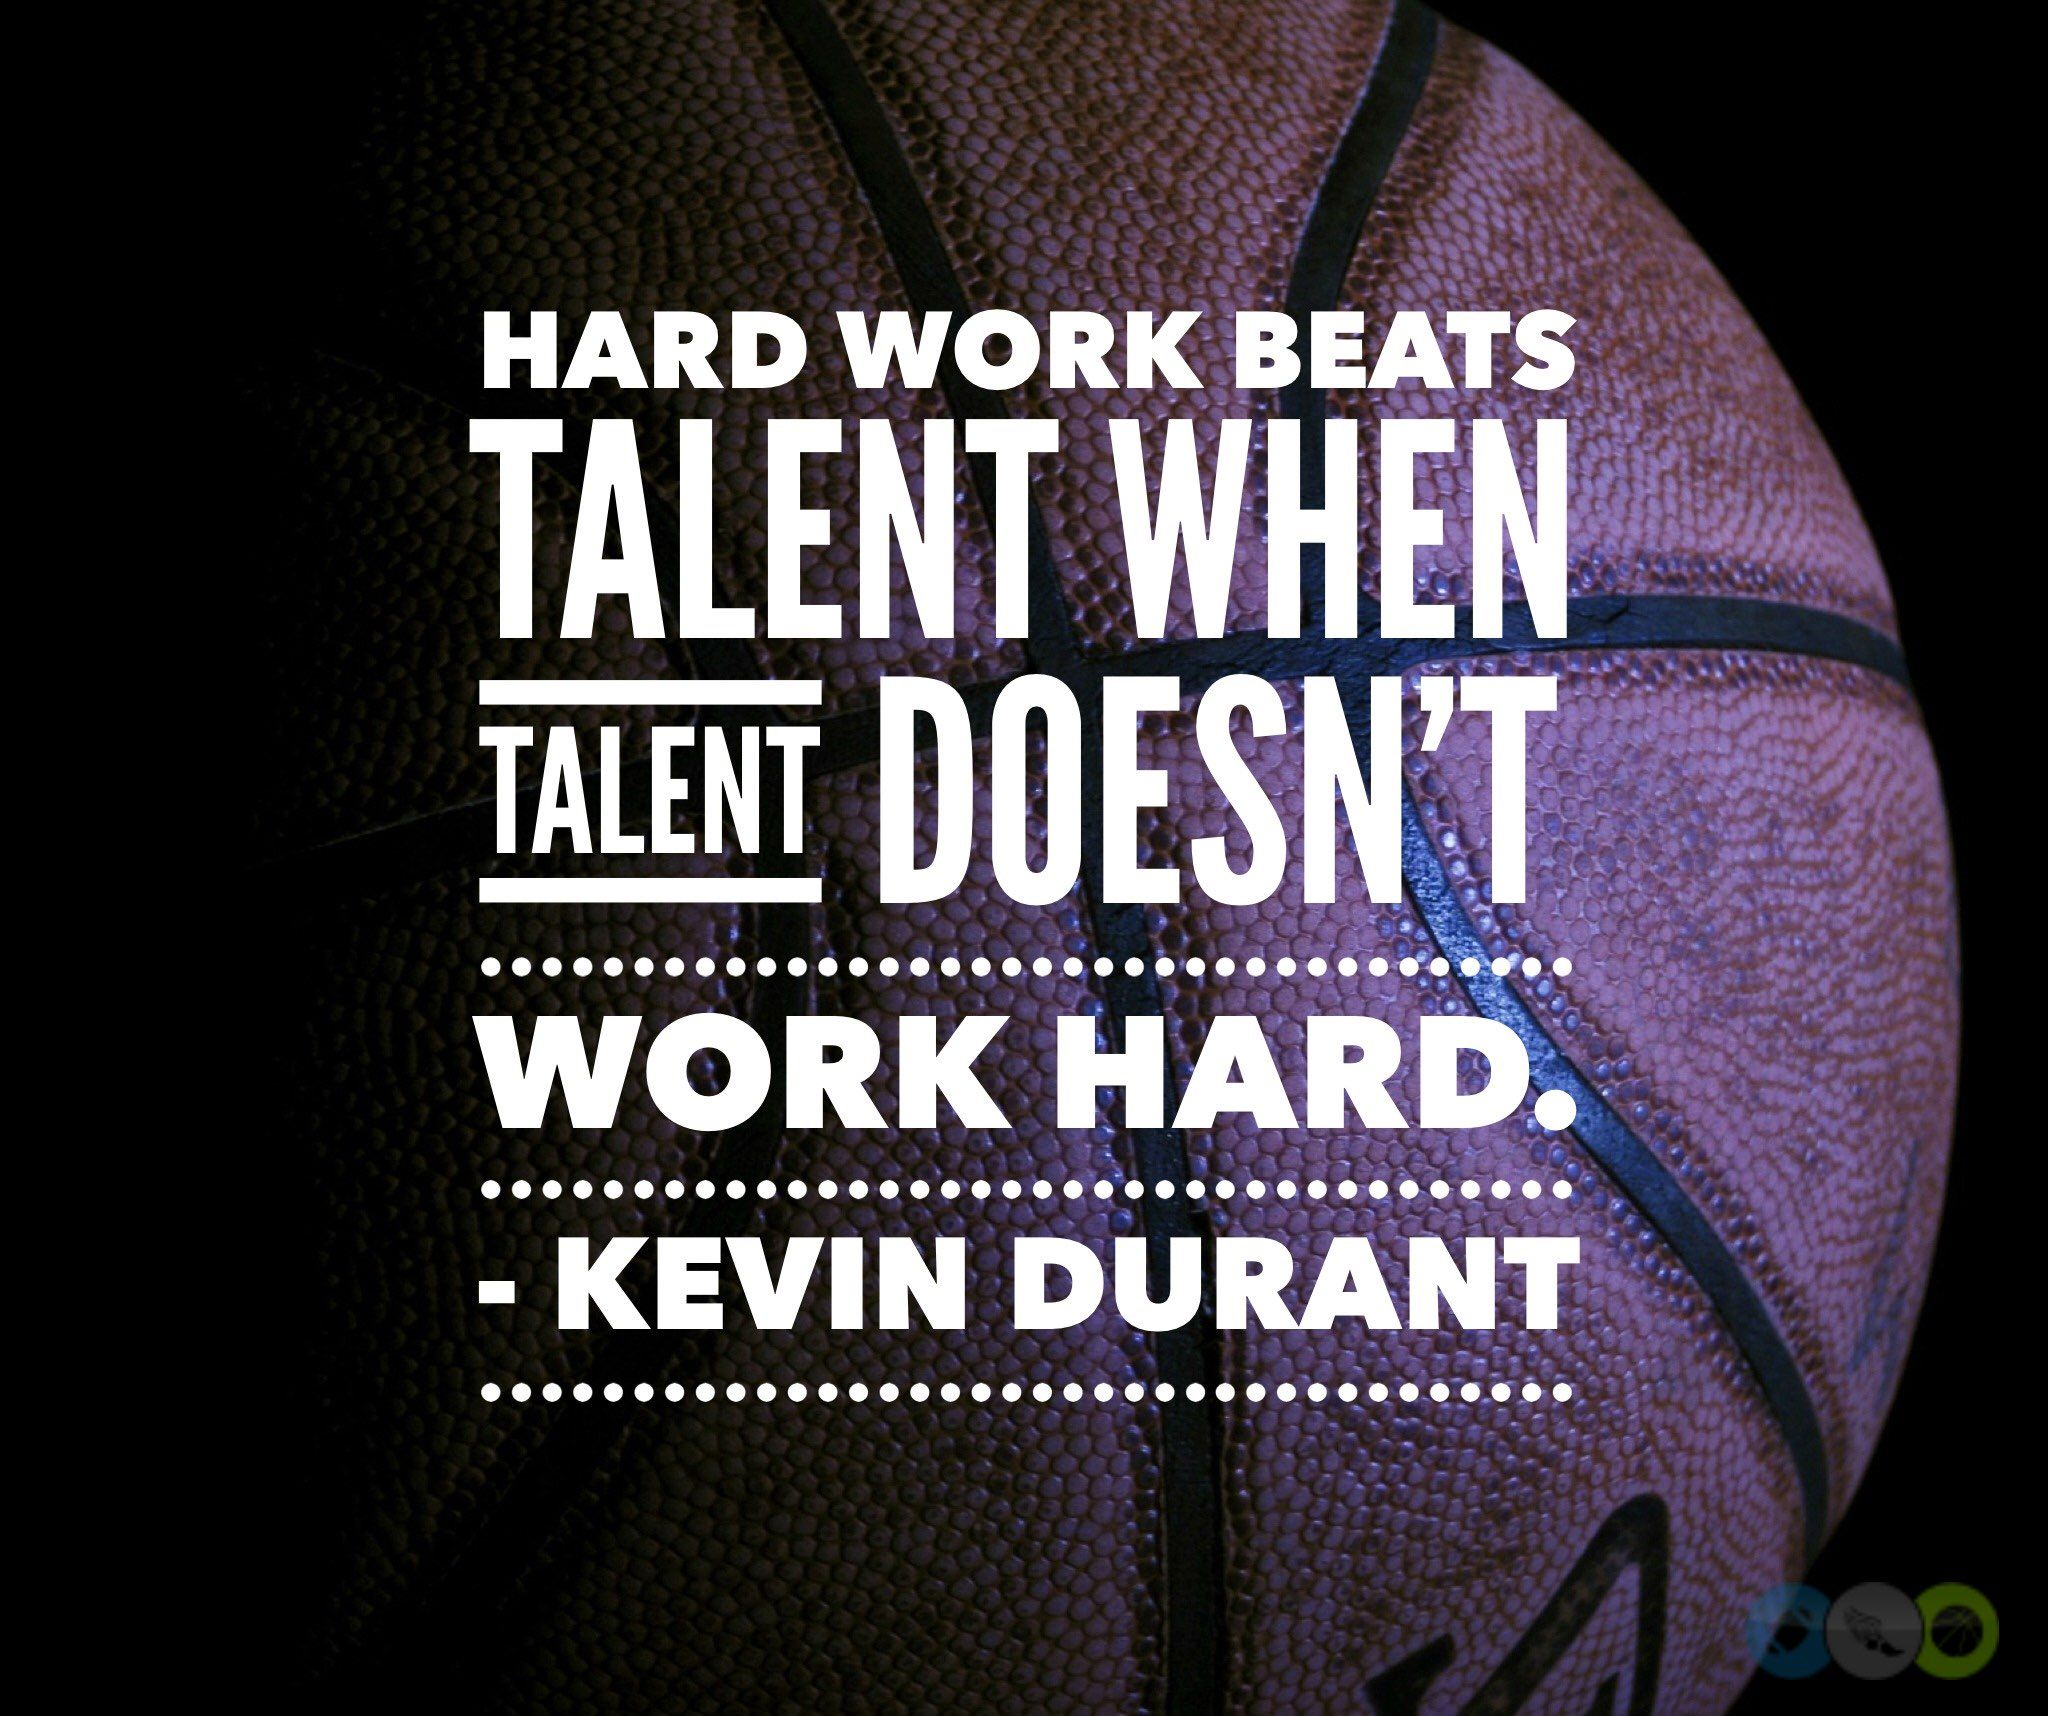 Kevin Durant Quote Kevin Durant Quote  Quotes  Pinterest  Photos Kevin O'leary